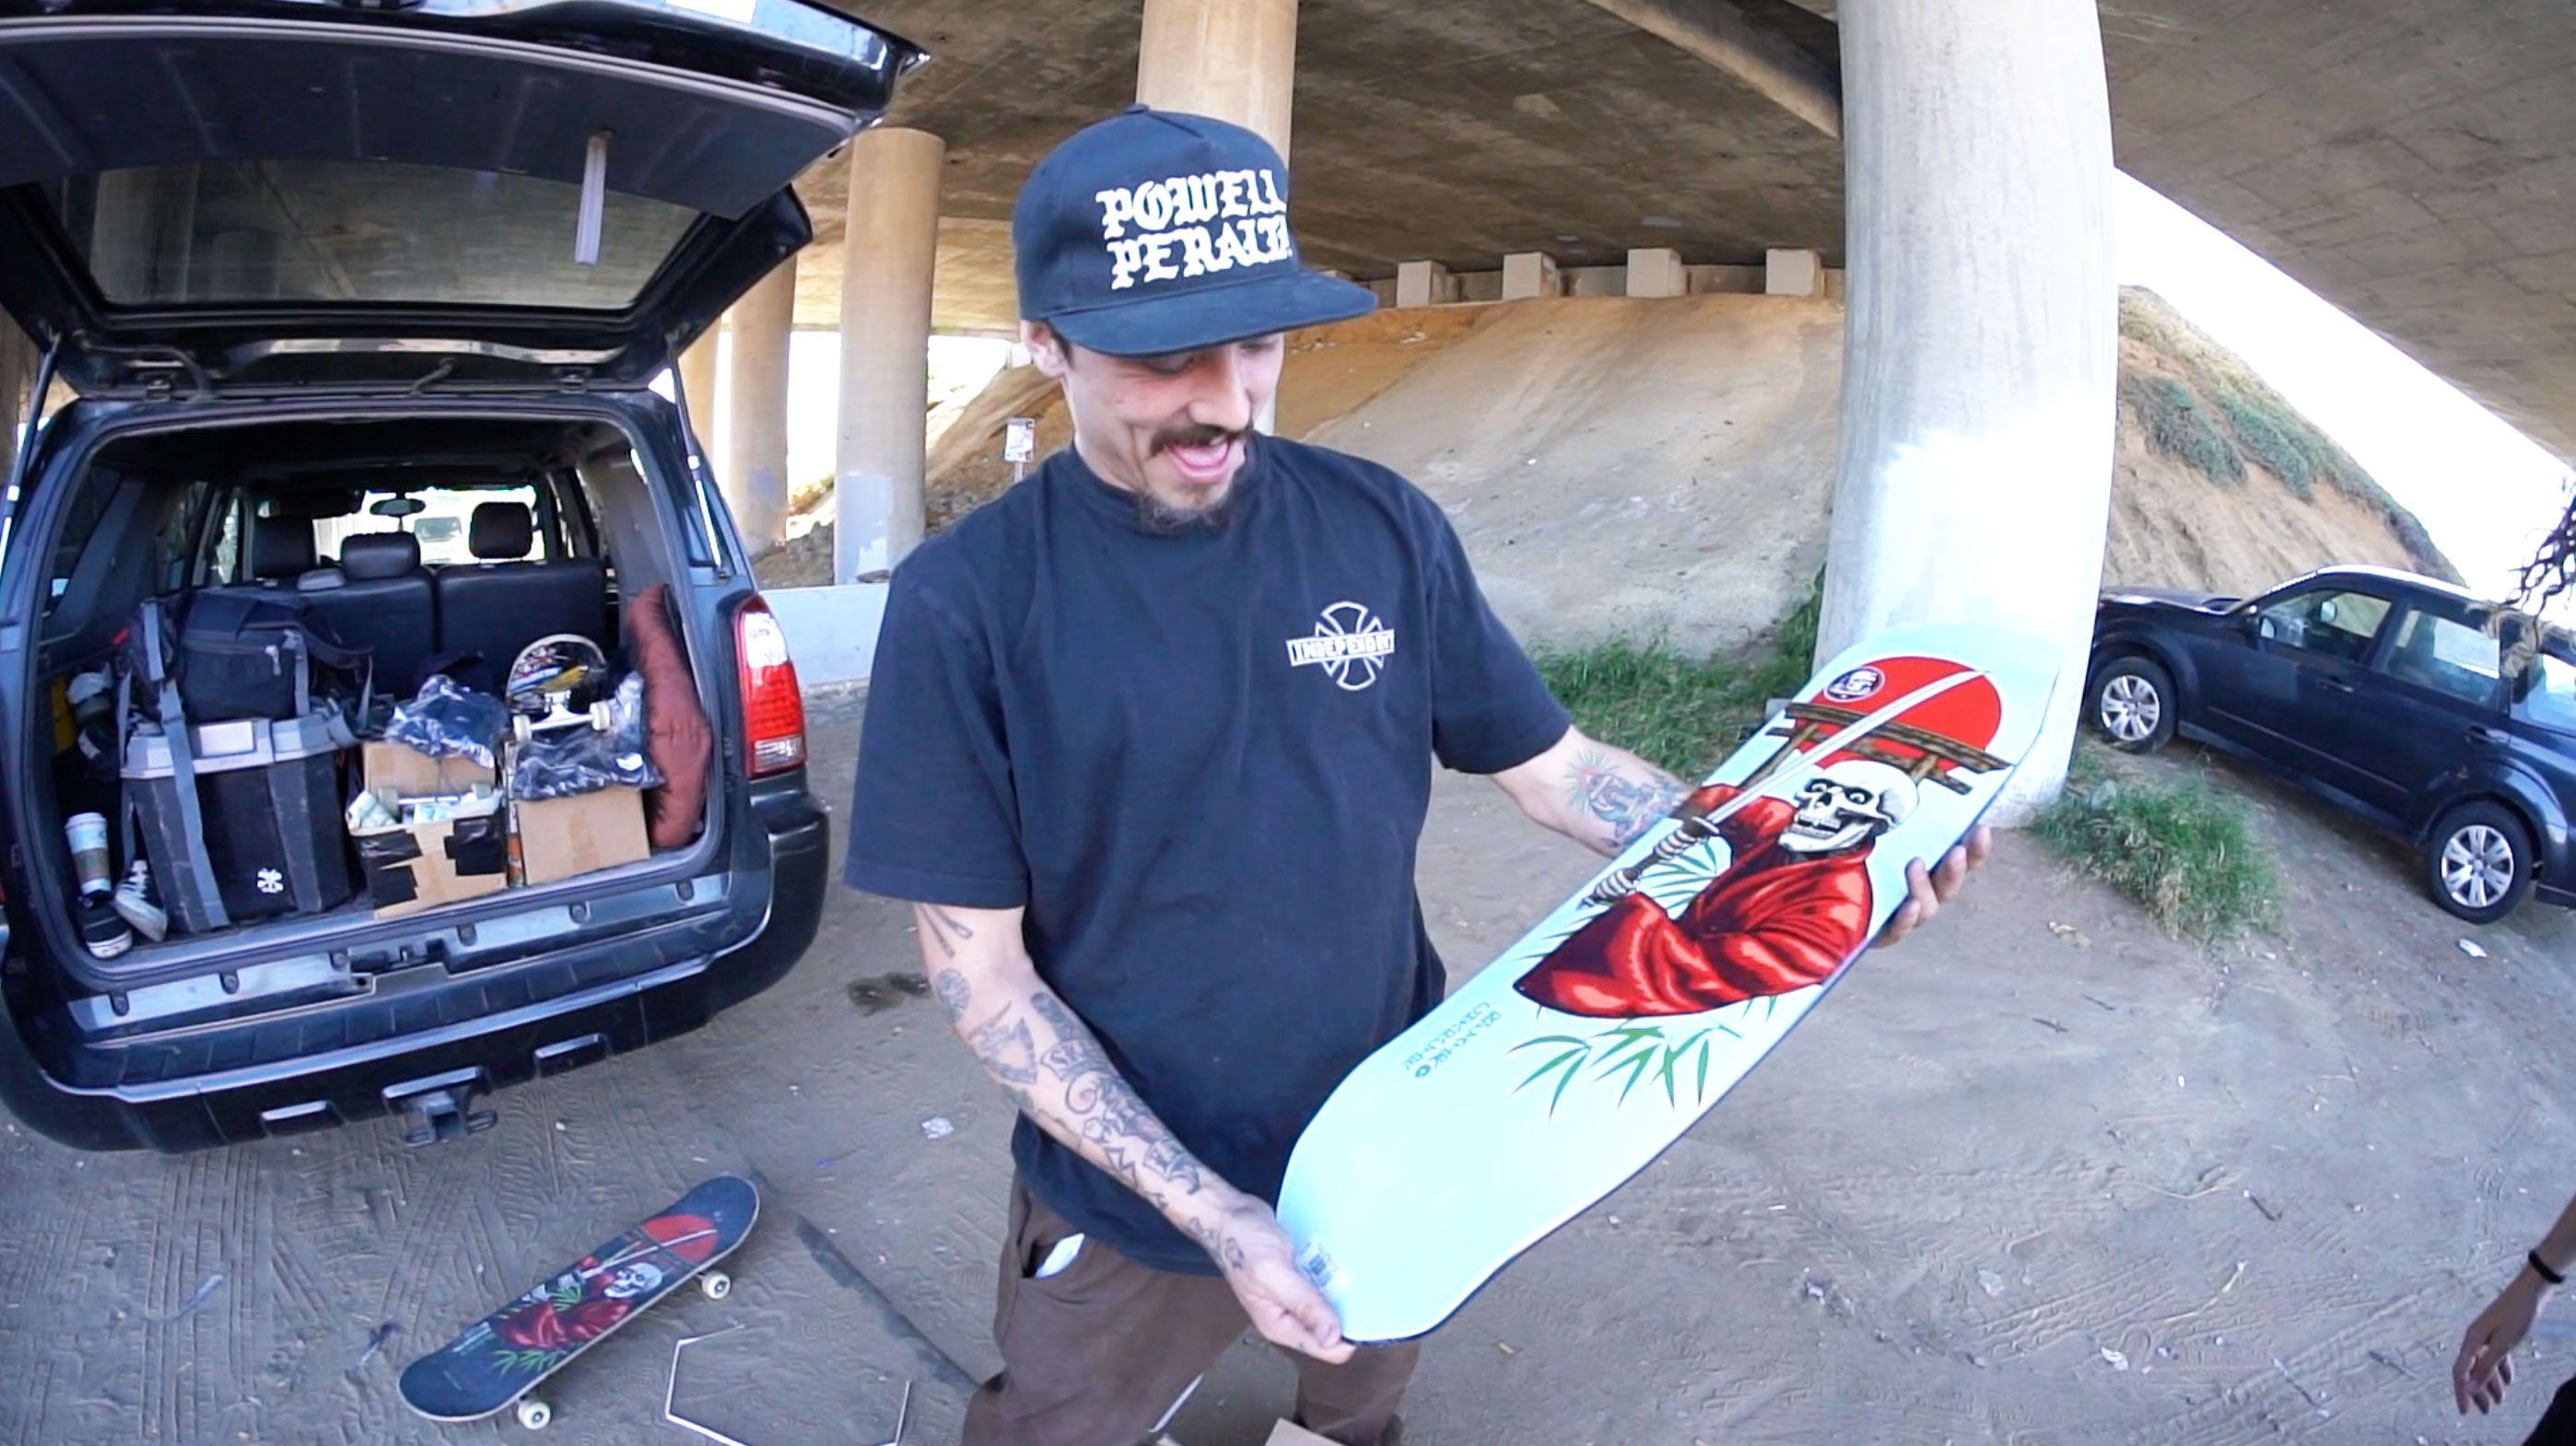 Powell Peralta Pro Charlie Blair Bushido Casket Skateboard Deck 8 75 X 32 Skateboard Decks Classic Skateboard Skateboard